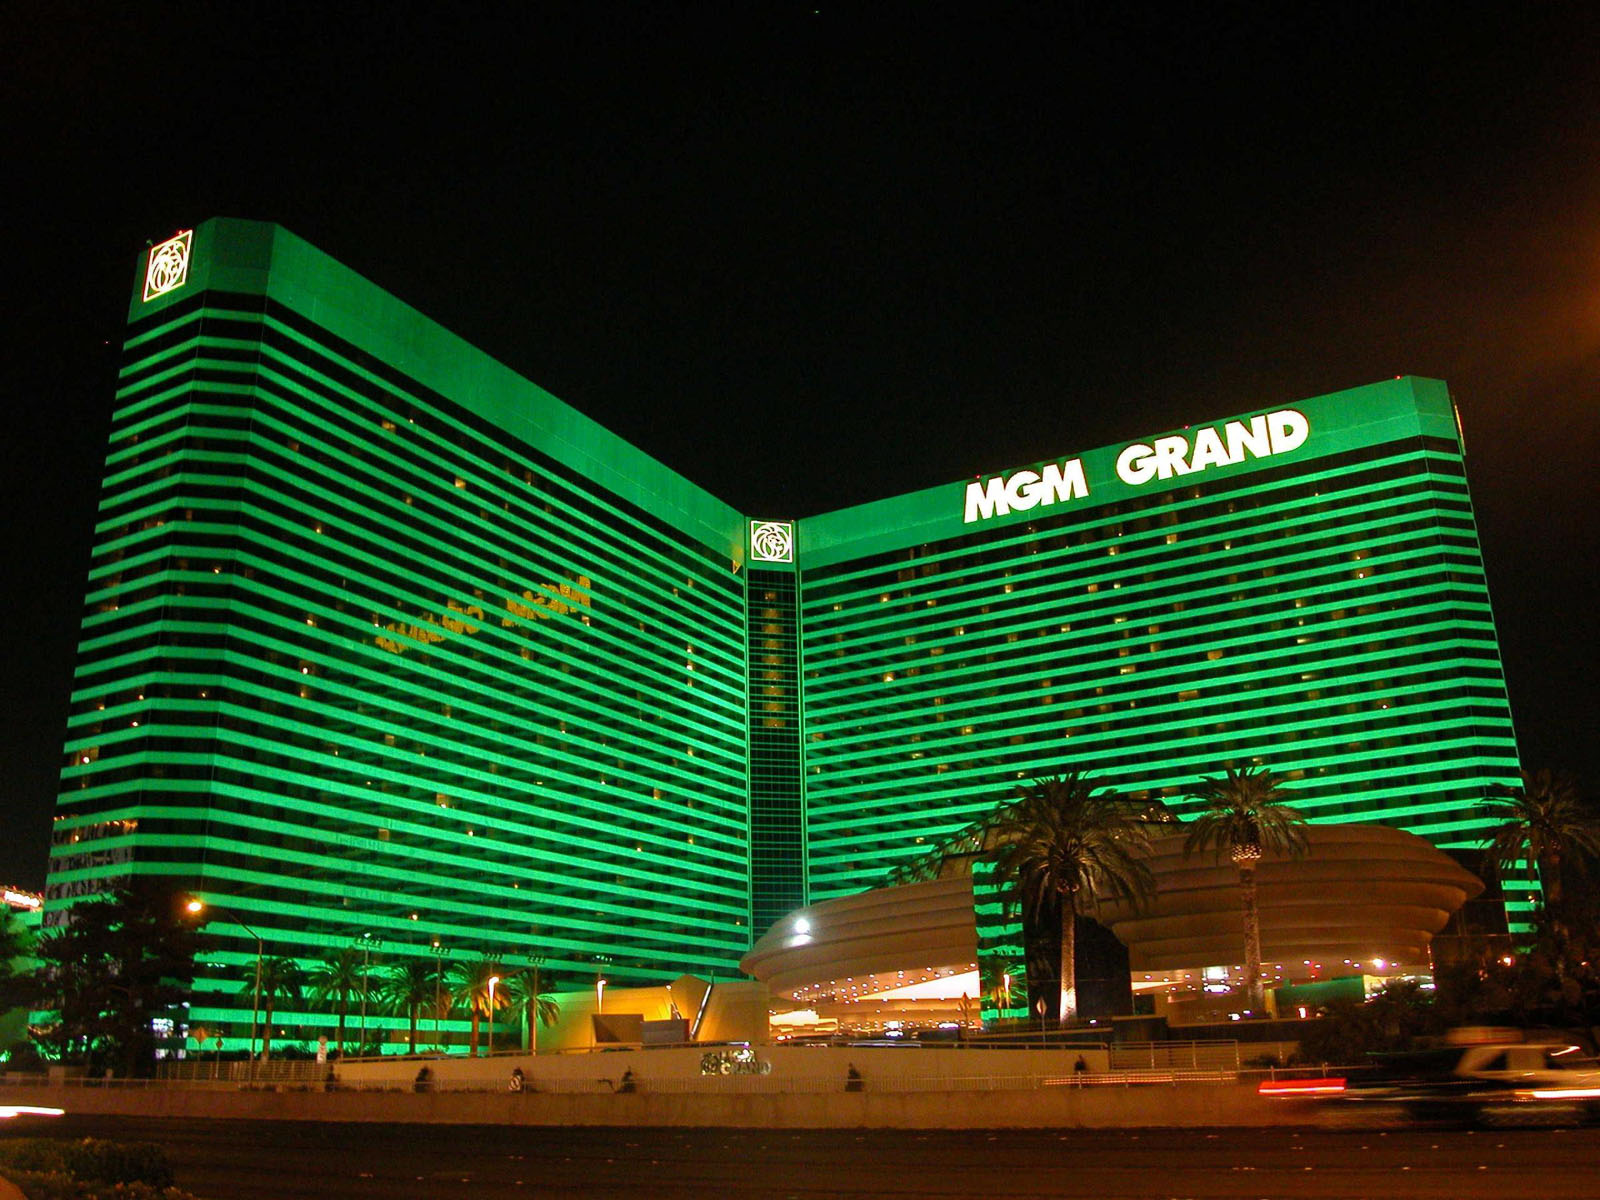 Grand Mgm